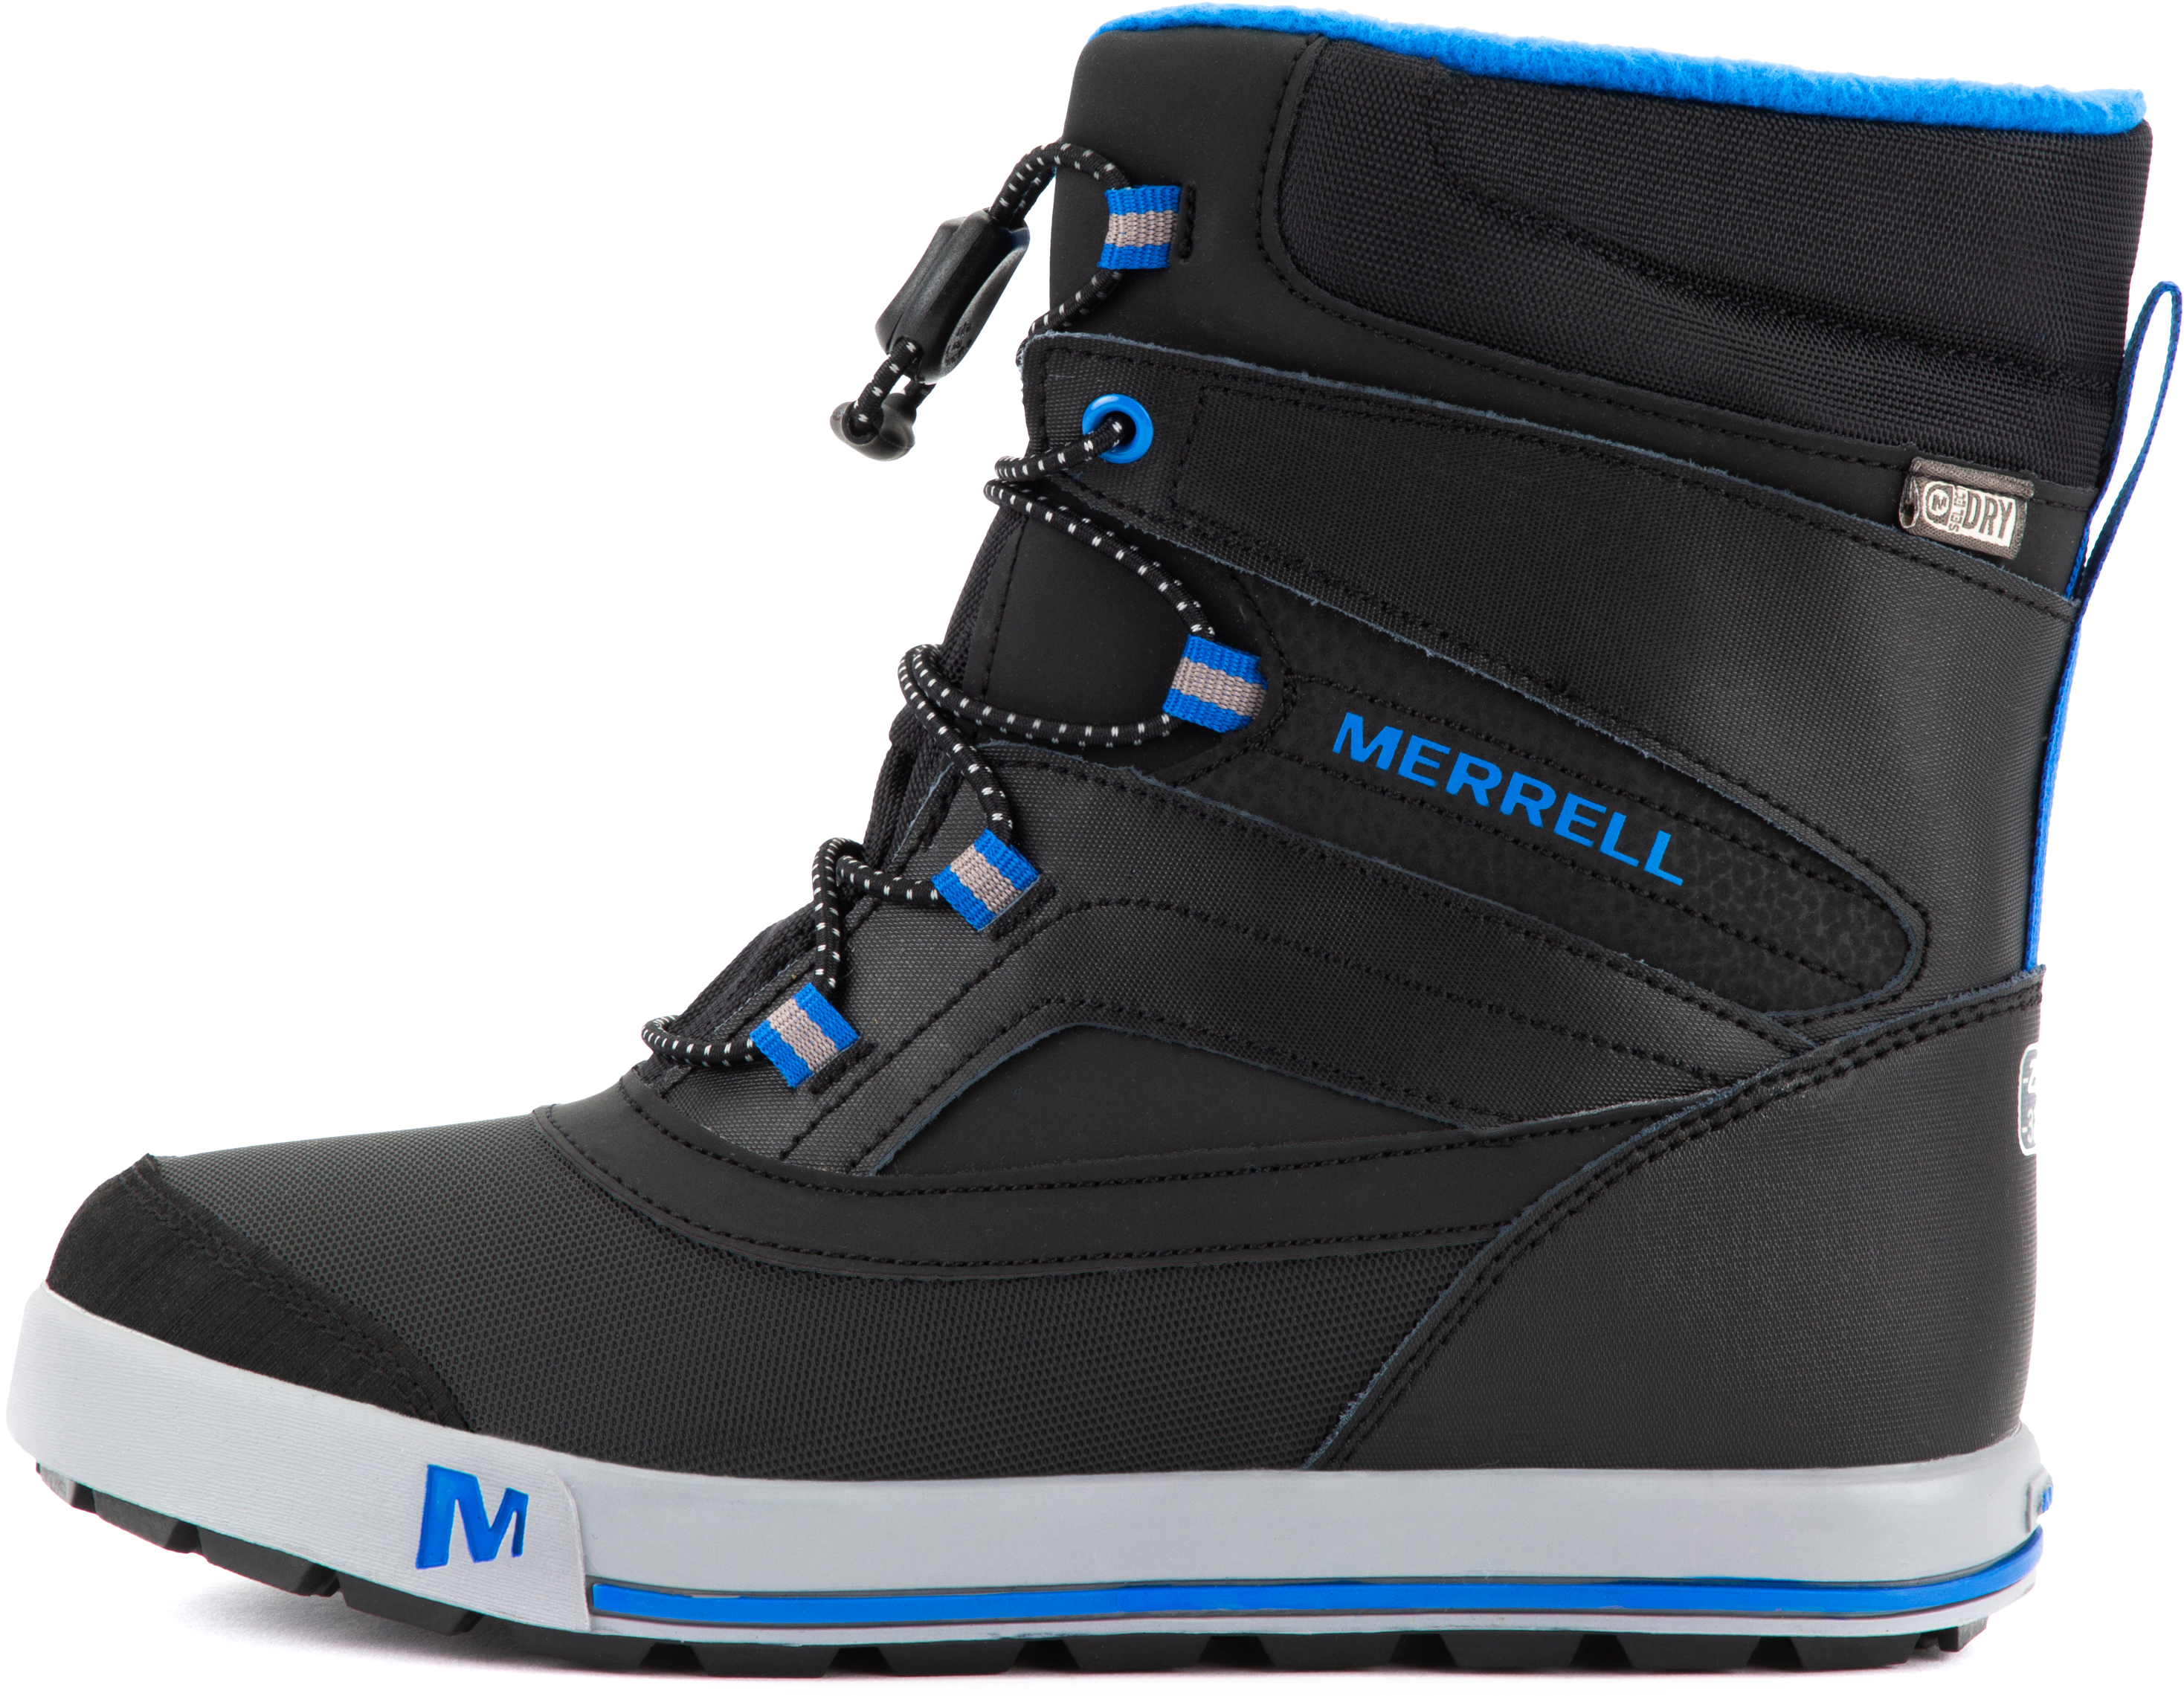 Merrell Ботинки утепленные для мальчиков Merrell Ml-Boys Snow Bank 2.0, размер 40,5 цены онлайн